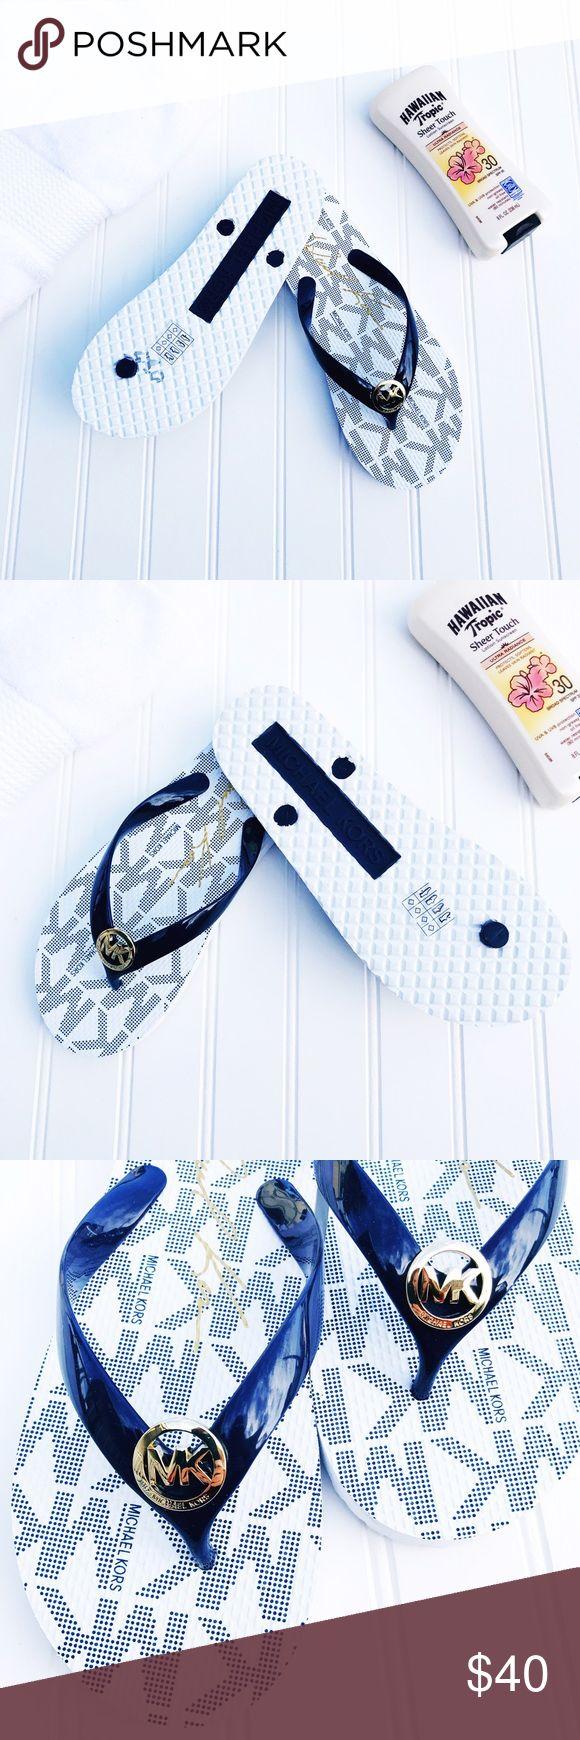 Michael Kors Blue And White Flip Flops NWOB Michael Kors Blue And White Flip Flops.  No box. Michael Kors Shoes Sandals